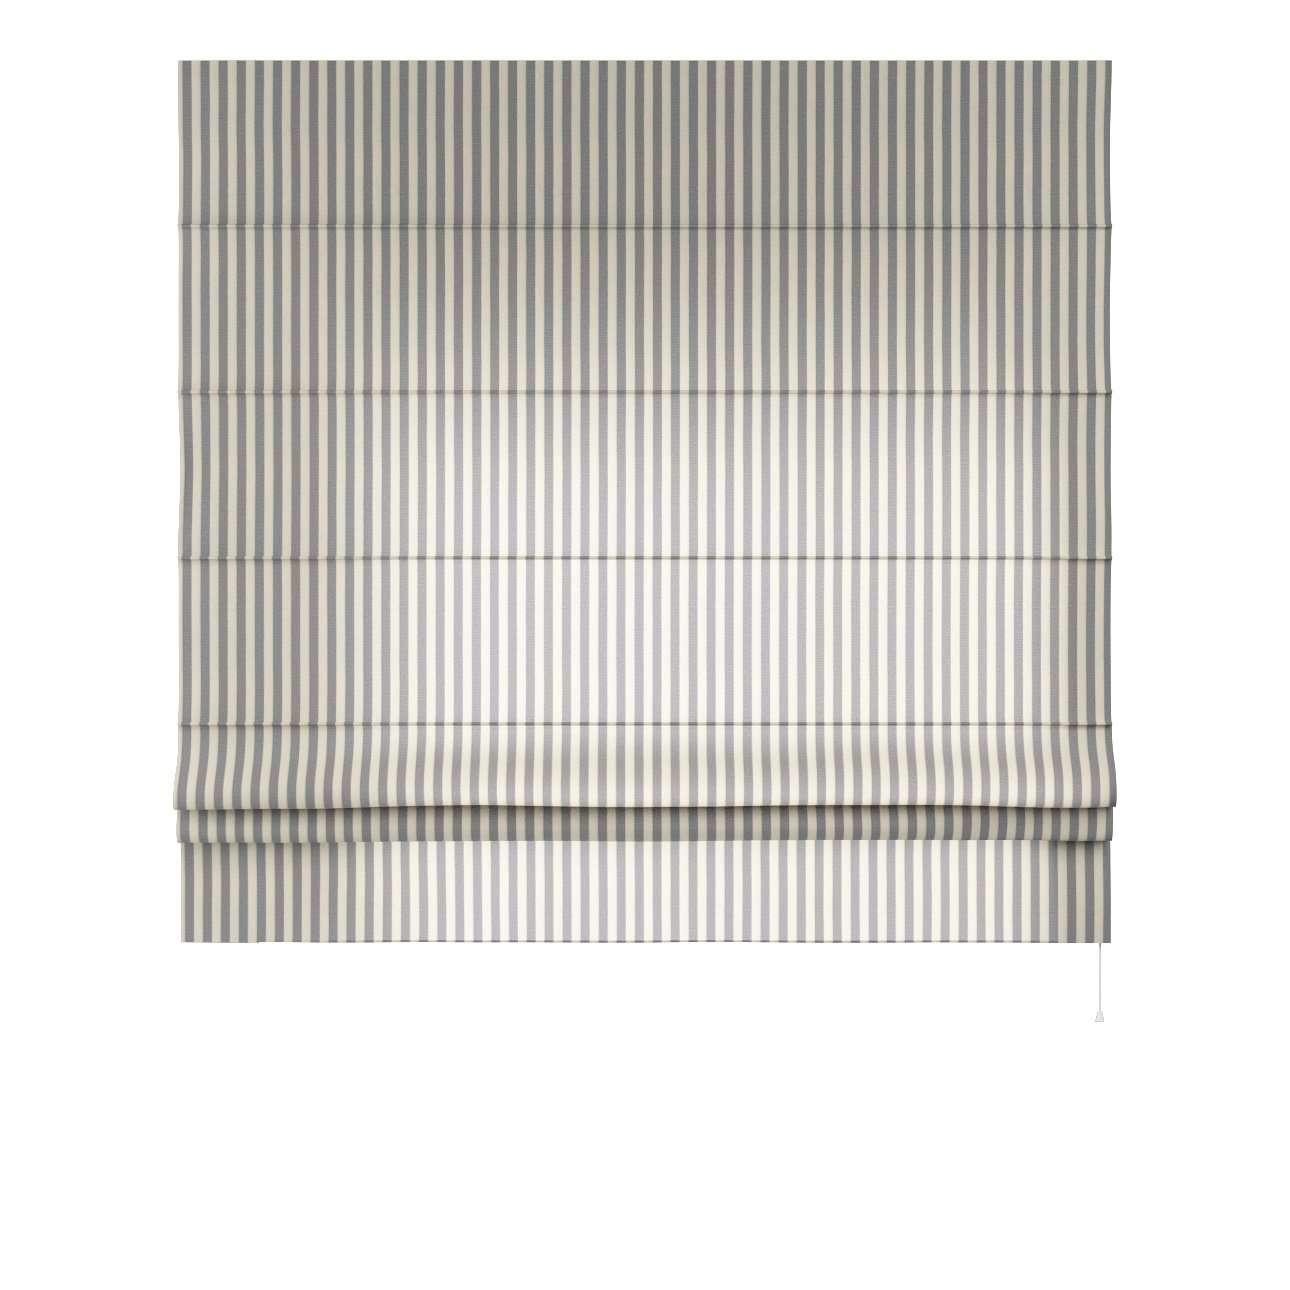 vouwgordijn Padva 80 x 170 cm van de collectie Quadro, Stof: 136-02